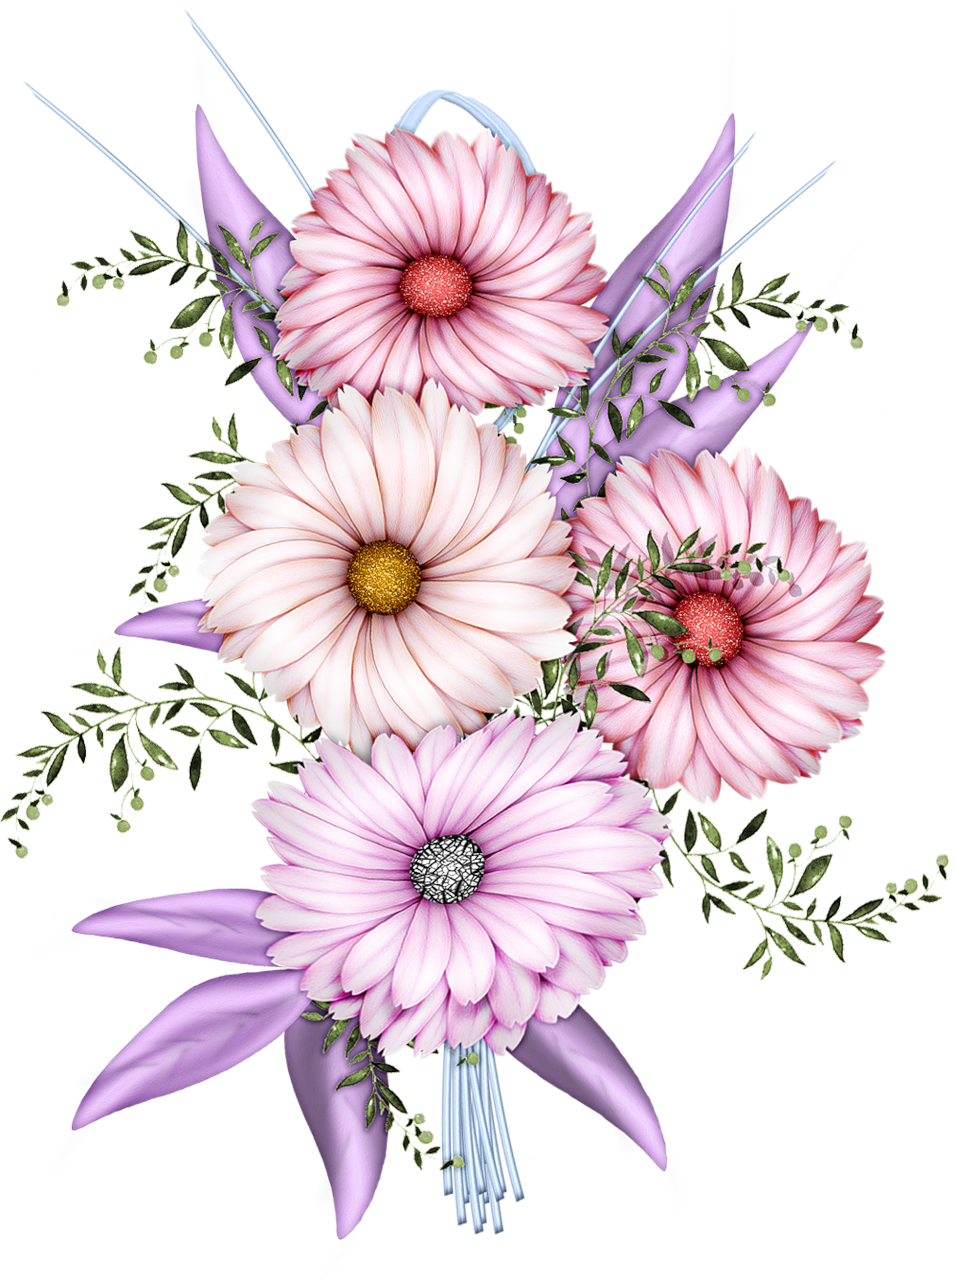 Daffodil clipart trumpet flower. Flores dekopaj pinterest flowers